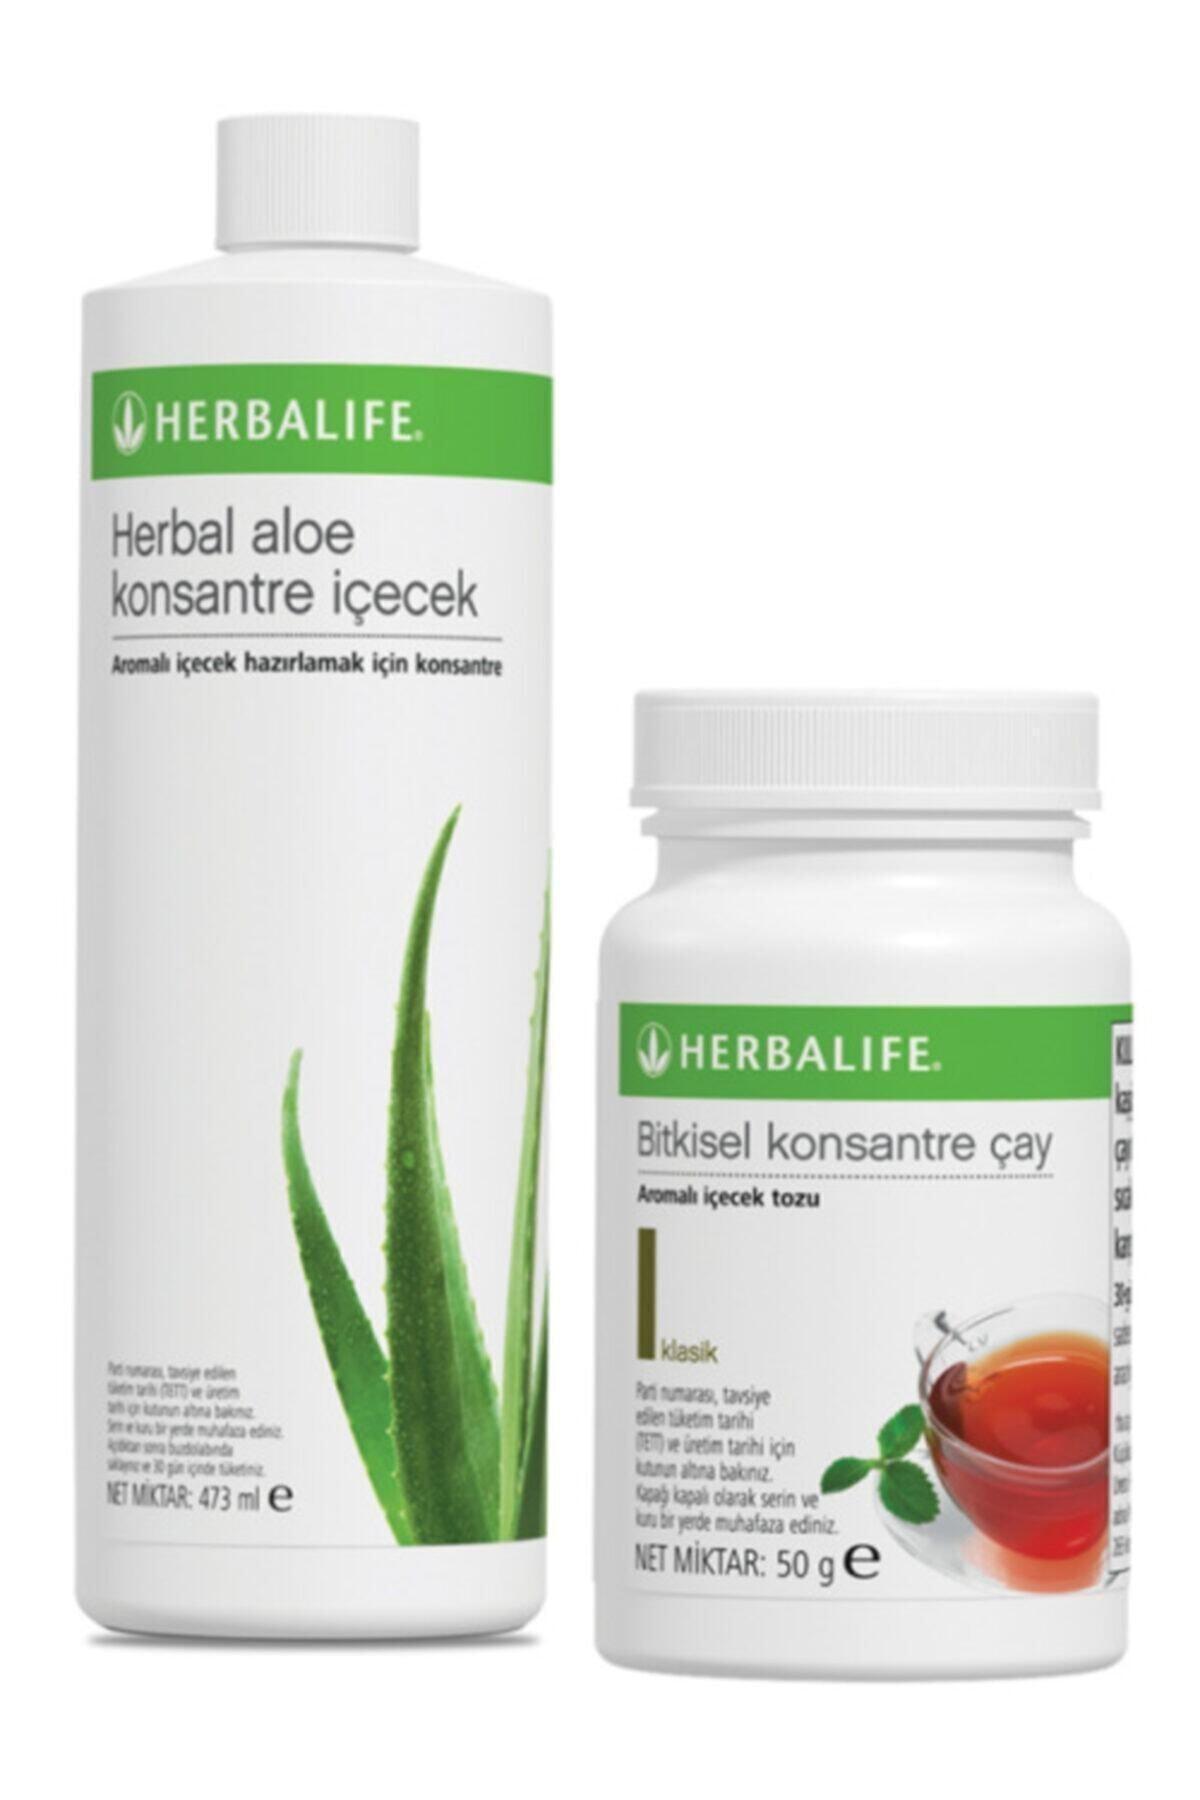 Herbalife Set Aloe Konsantre Içecek Ve Klasik 50g Çay 1